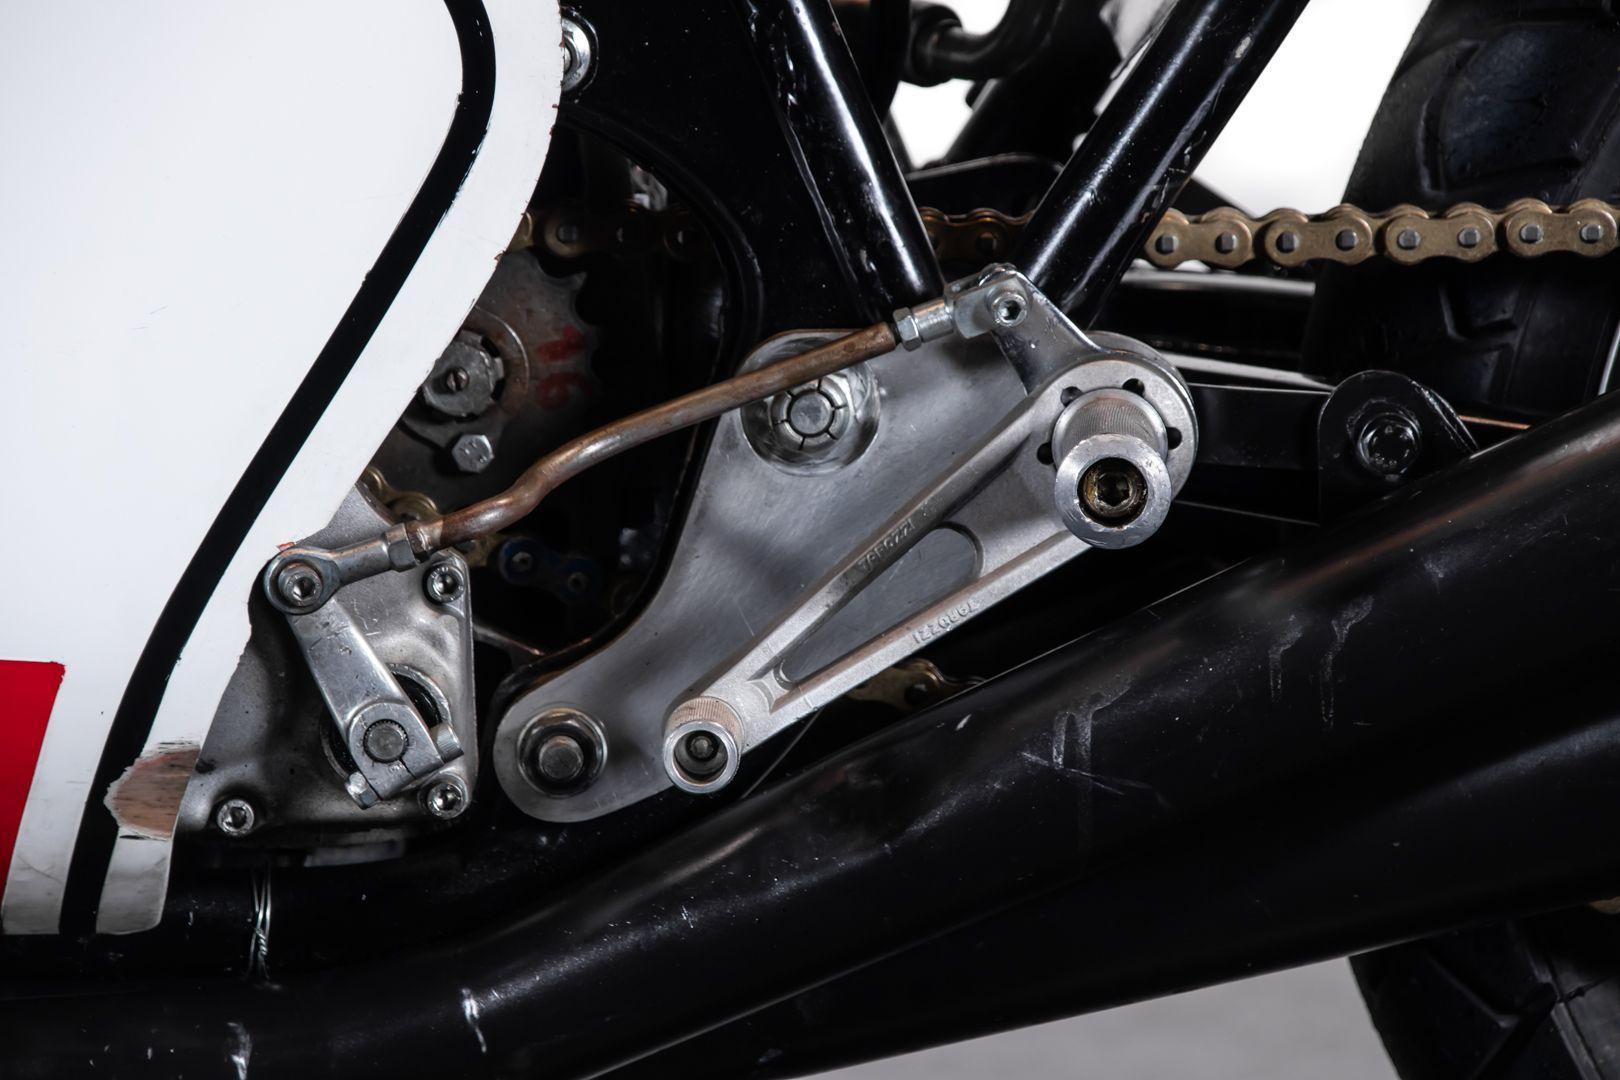 1973 Honda 750 Daytona Replica 72312